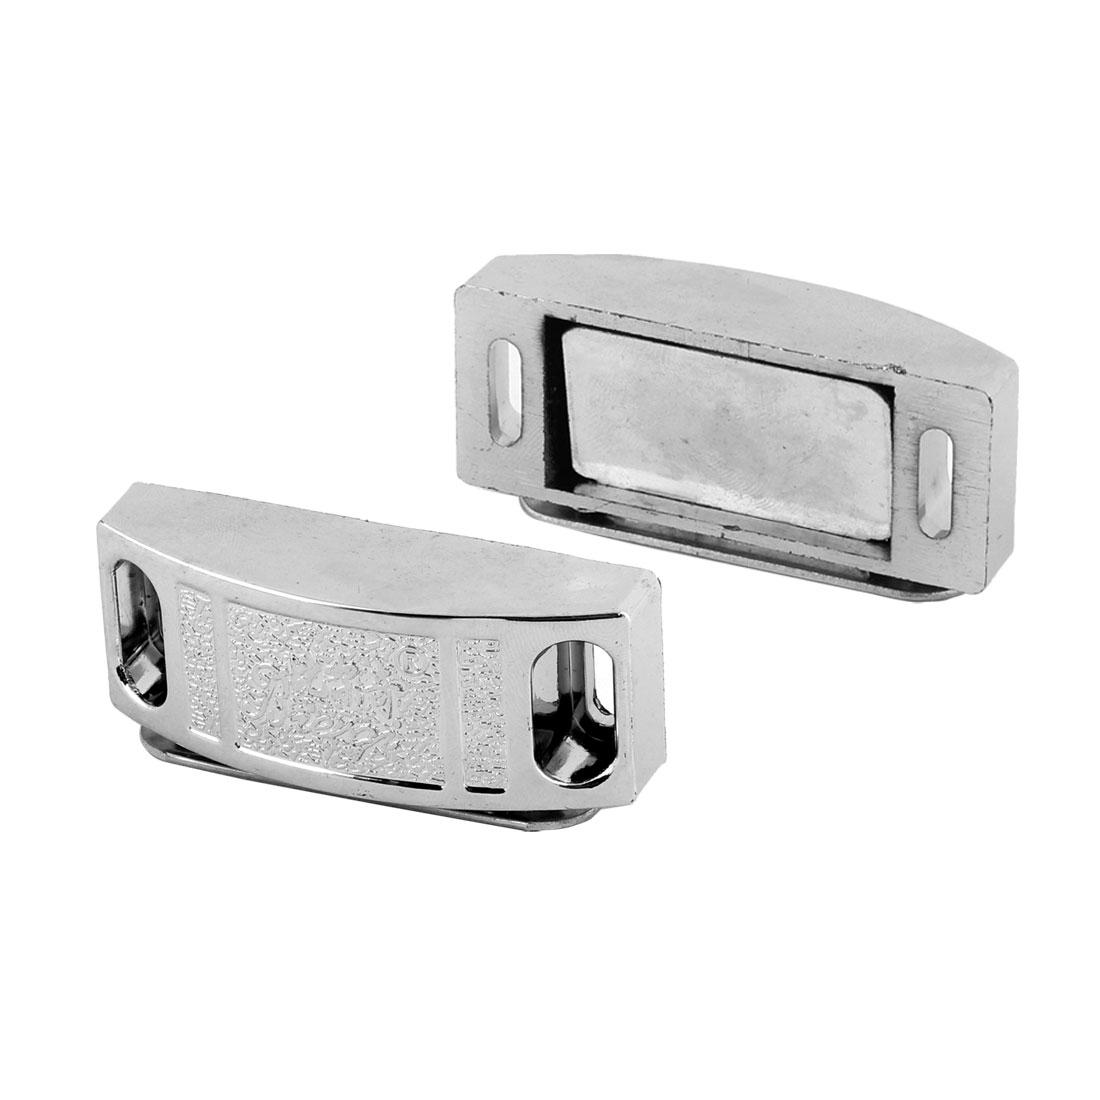 Hardware Cabinet Furniture Closet Magnetic Catch Stopper Silver Tone 2pcs